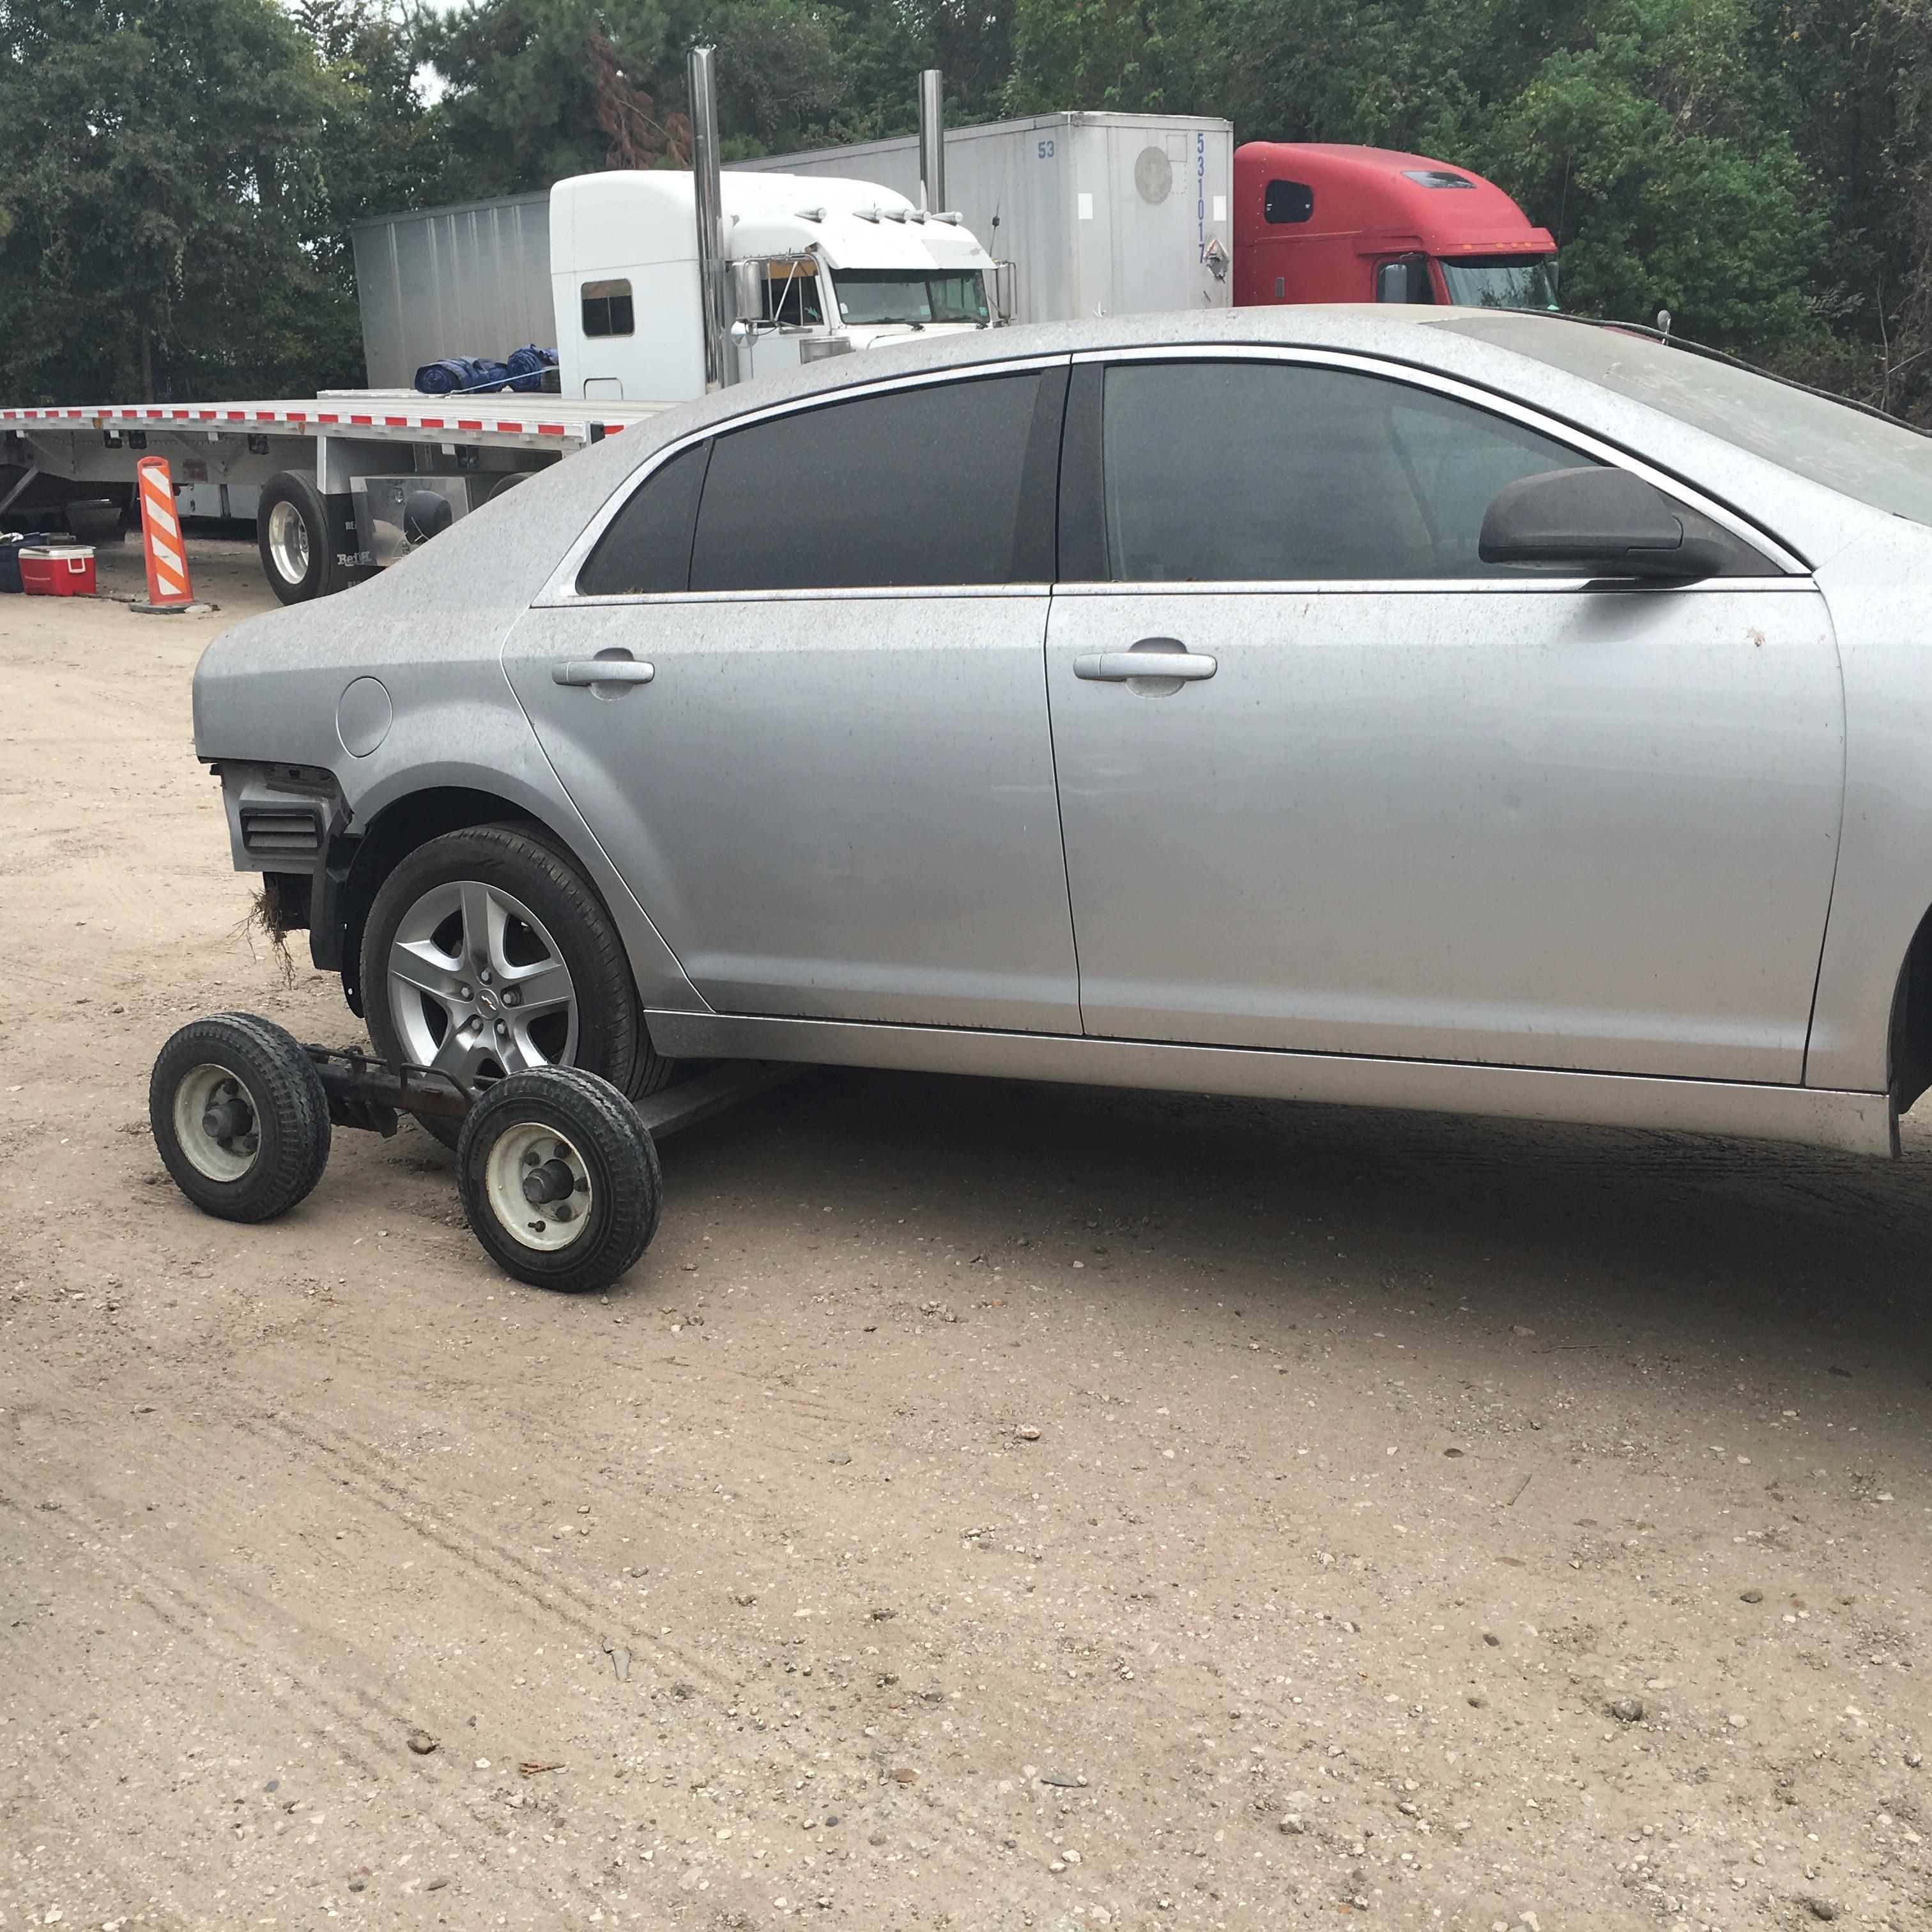 Car Dealer In Houston Tx: Used Car Dealers In Houston, Texas